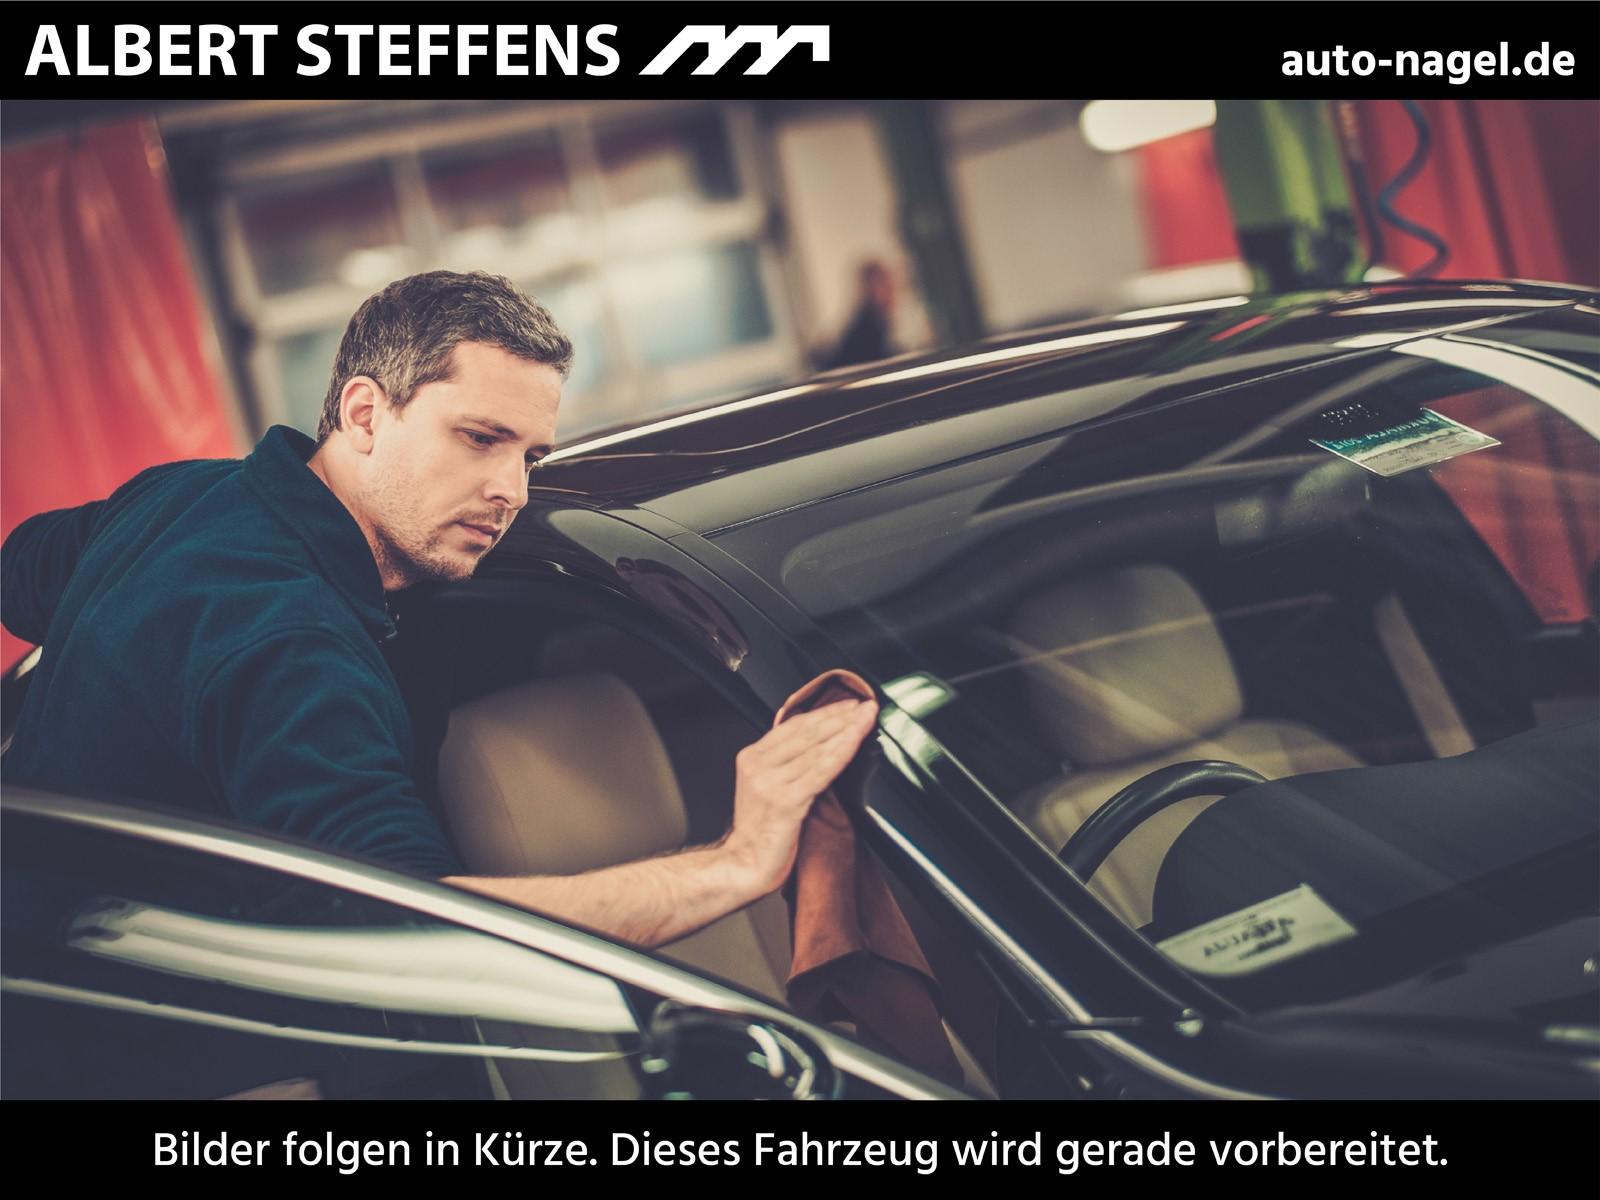 Mercedes-Benz GLE 350 d 4MATIC AMG COMAND+STANDH+DISTR+ILS+SHZ, Jahr 2016, Diesel